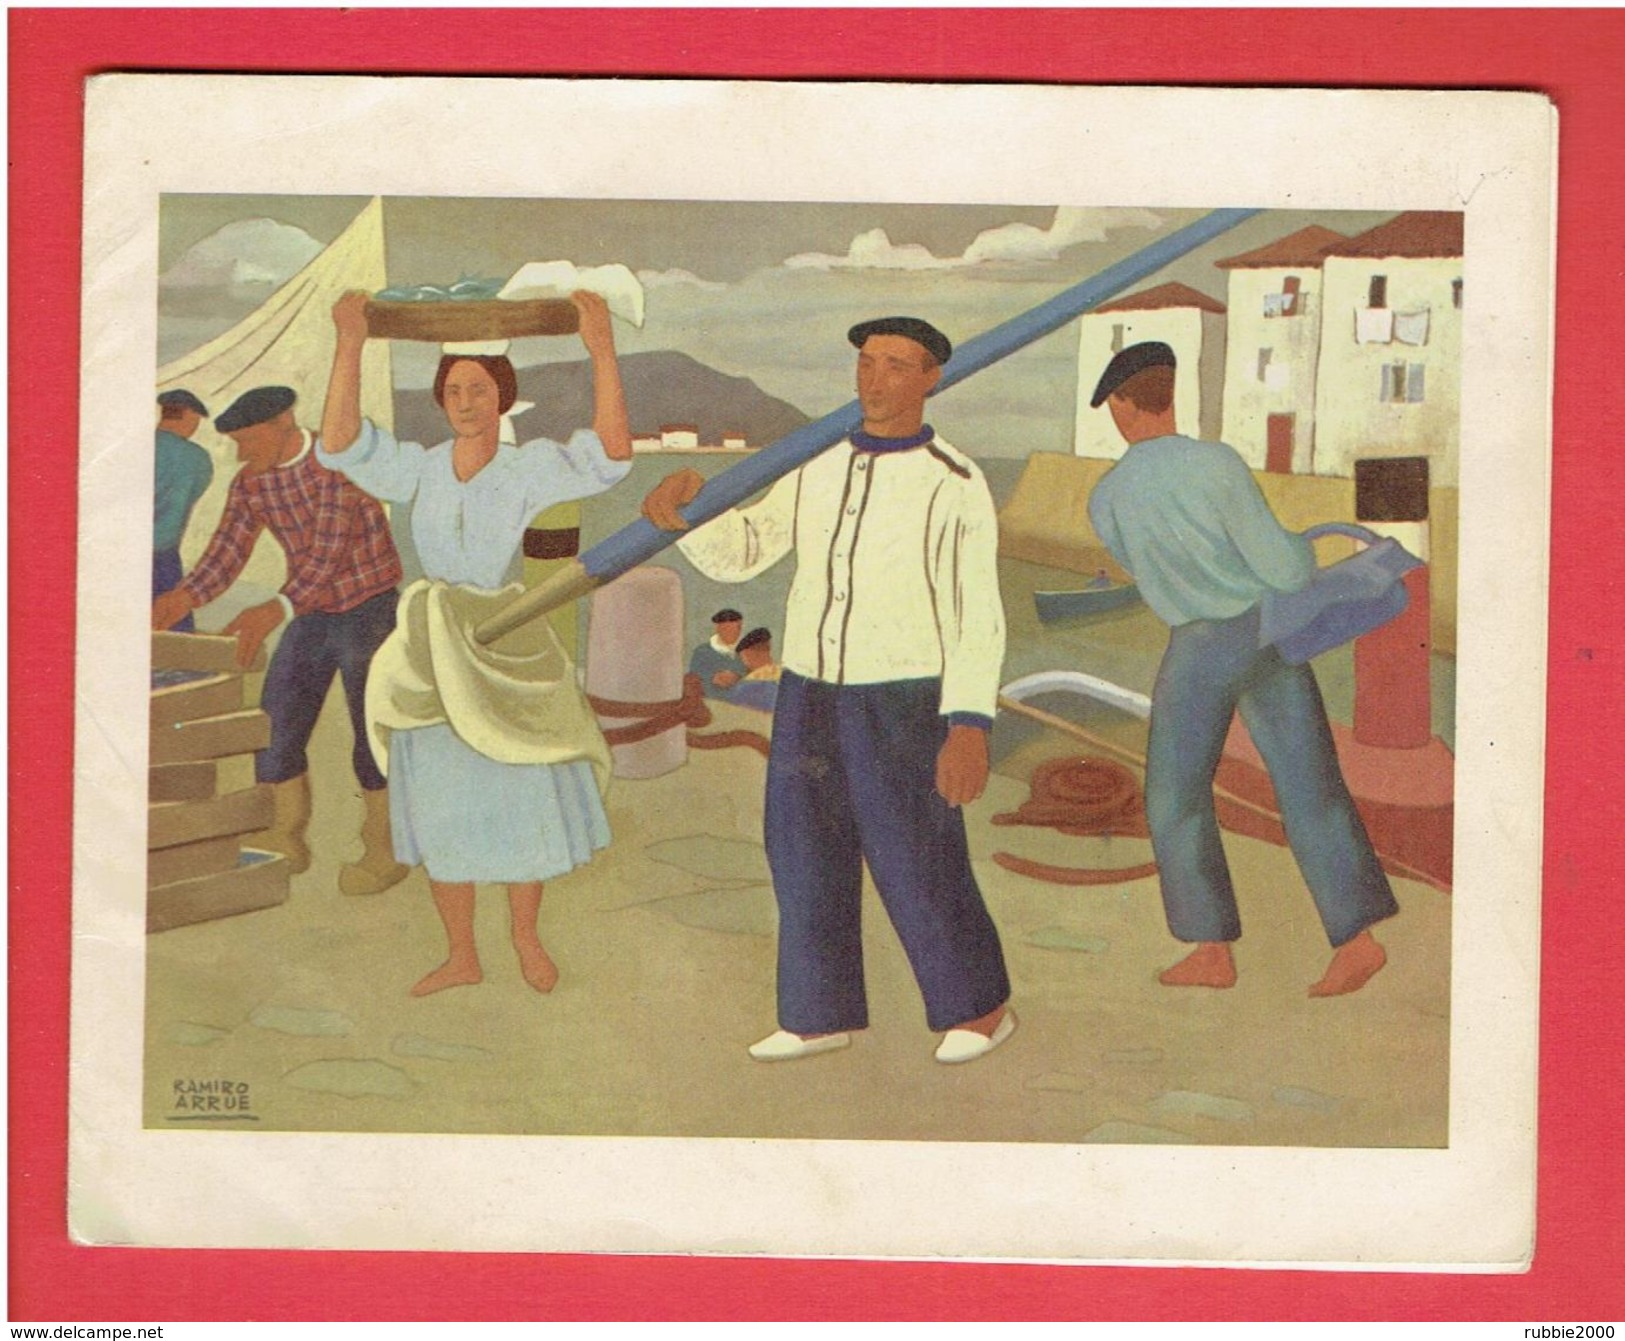 PAYS BASQUE 1964 TABLEAU DE RAMIRO ARRUE CARTE DOUBLE EN BON ETAT EDITEUR VALVERDE SAN SEBASTIAN - Spain